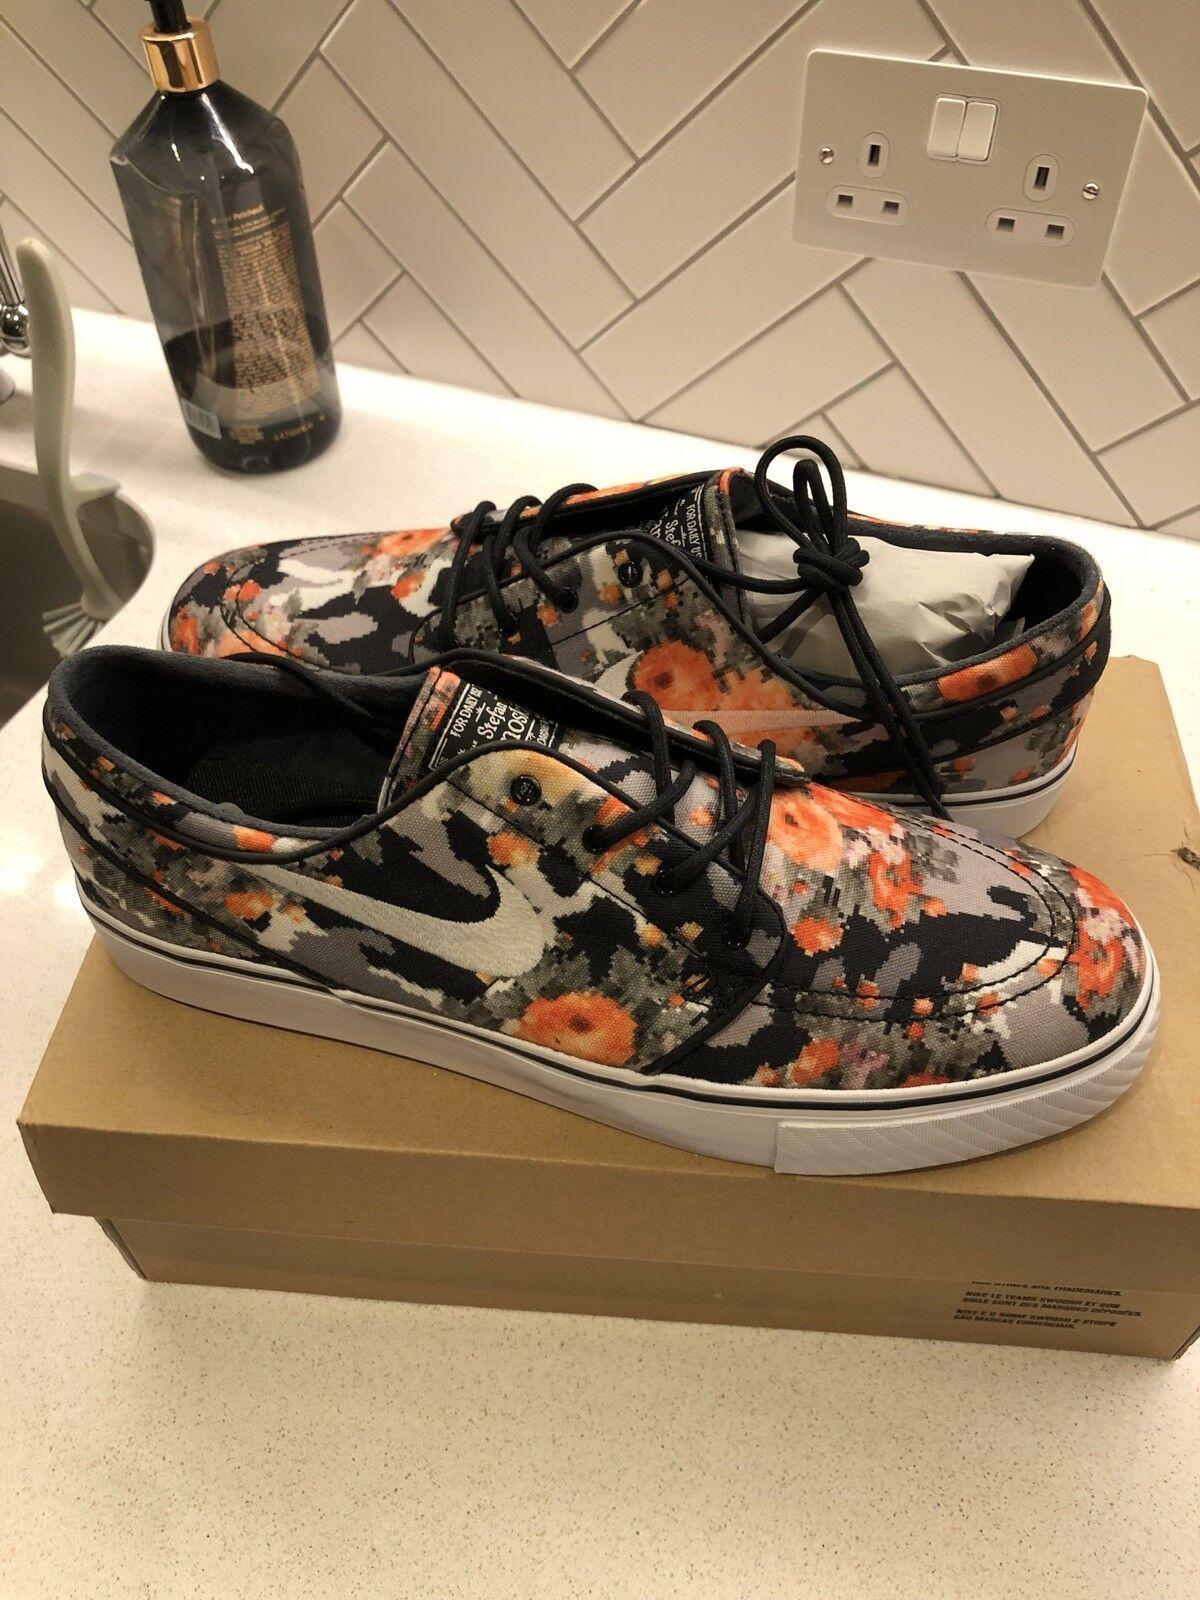 Nike zoom stefan janoski pr premio floreale pattinare imbarco scarpe